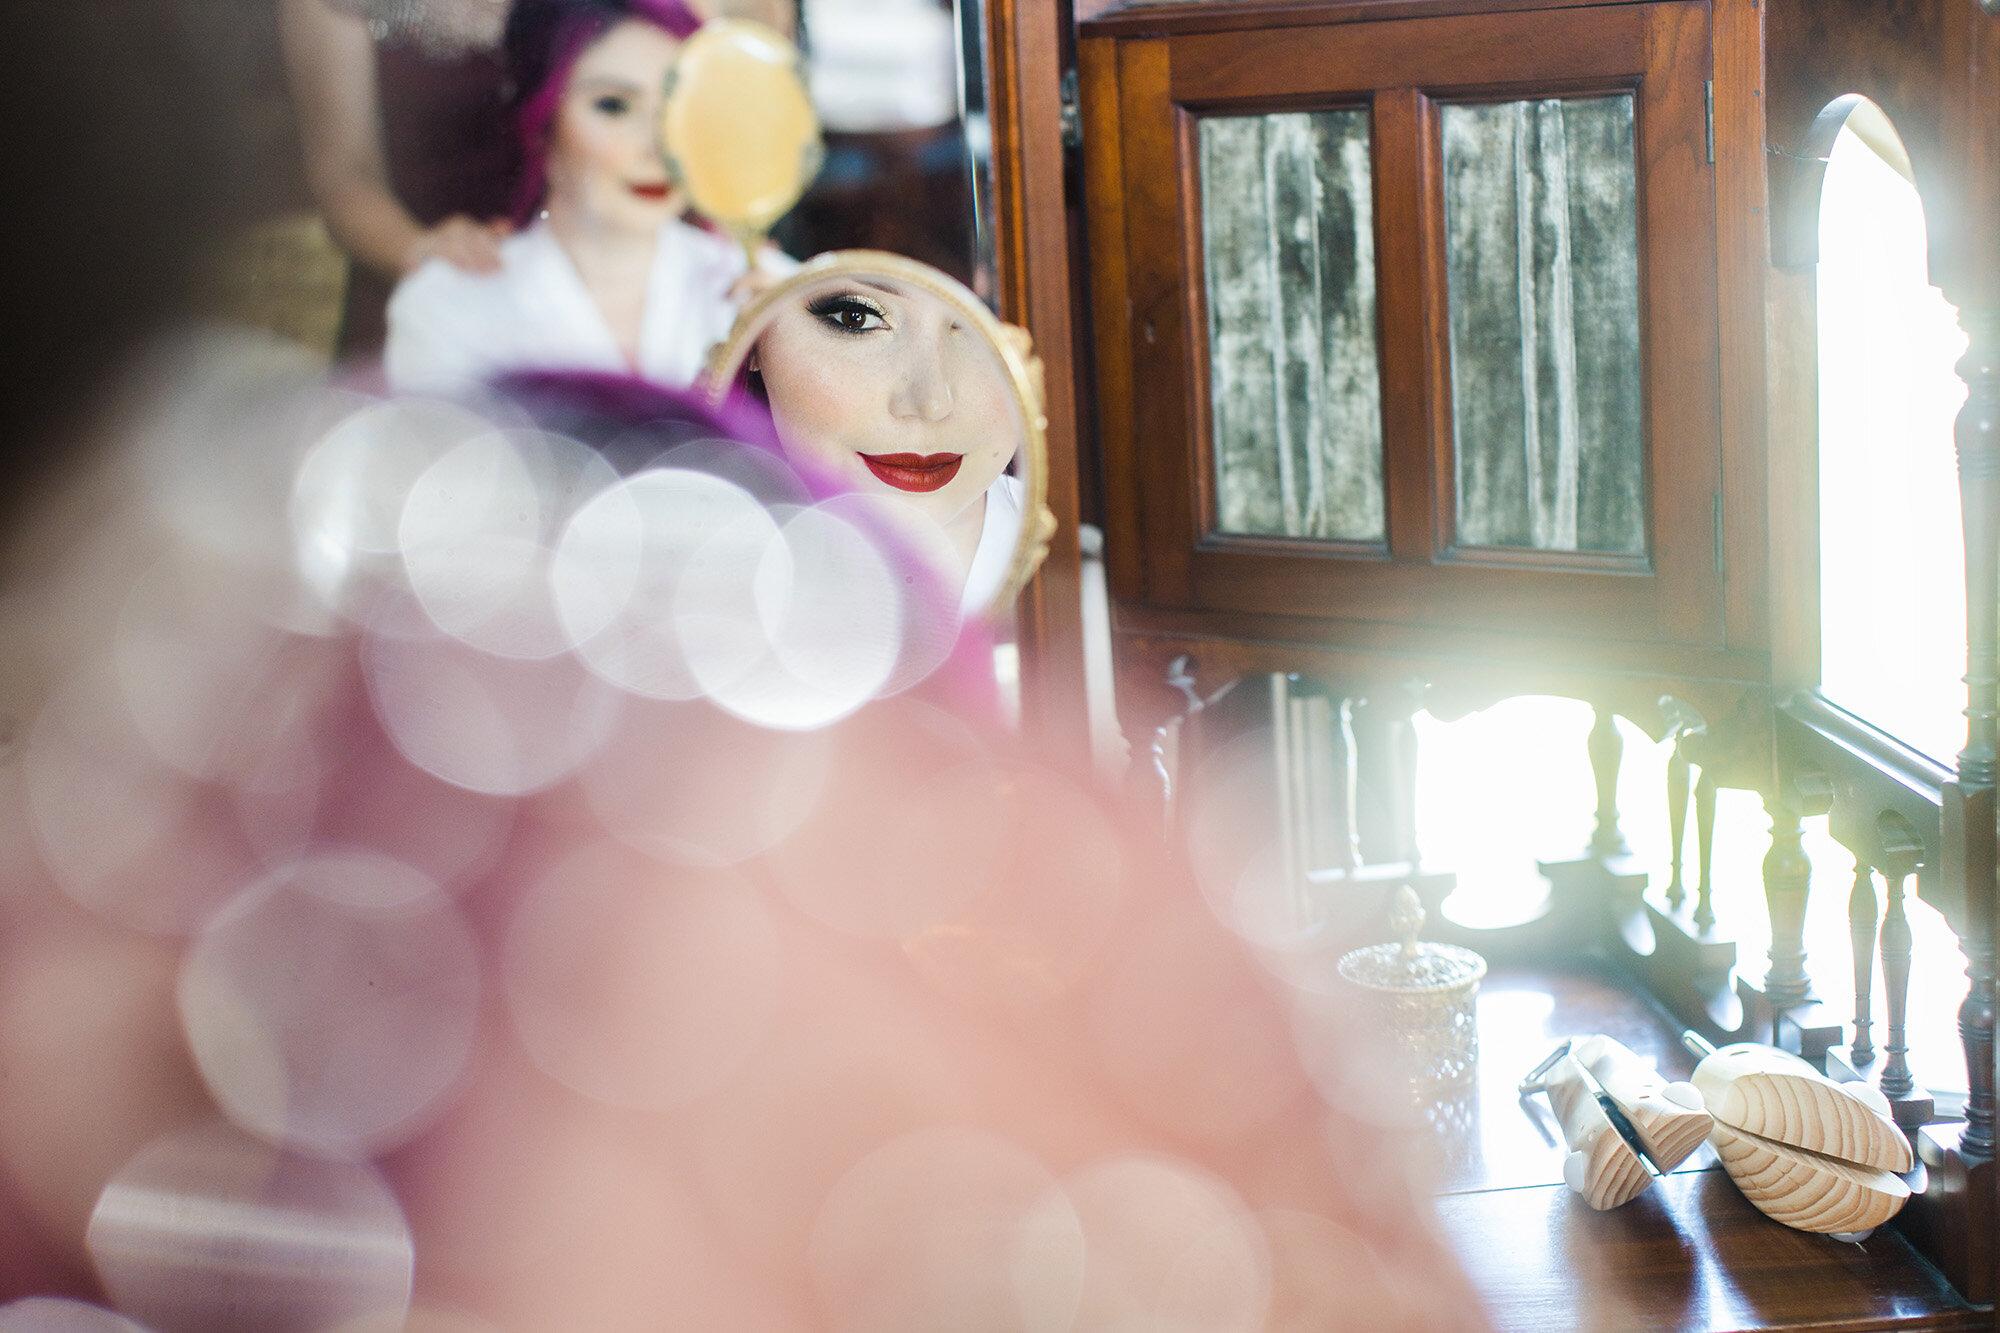 crazy-funchristmas-house-wedding-carrie-vines-003.jpg